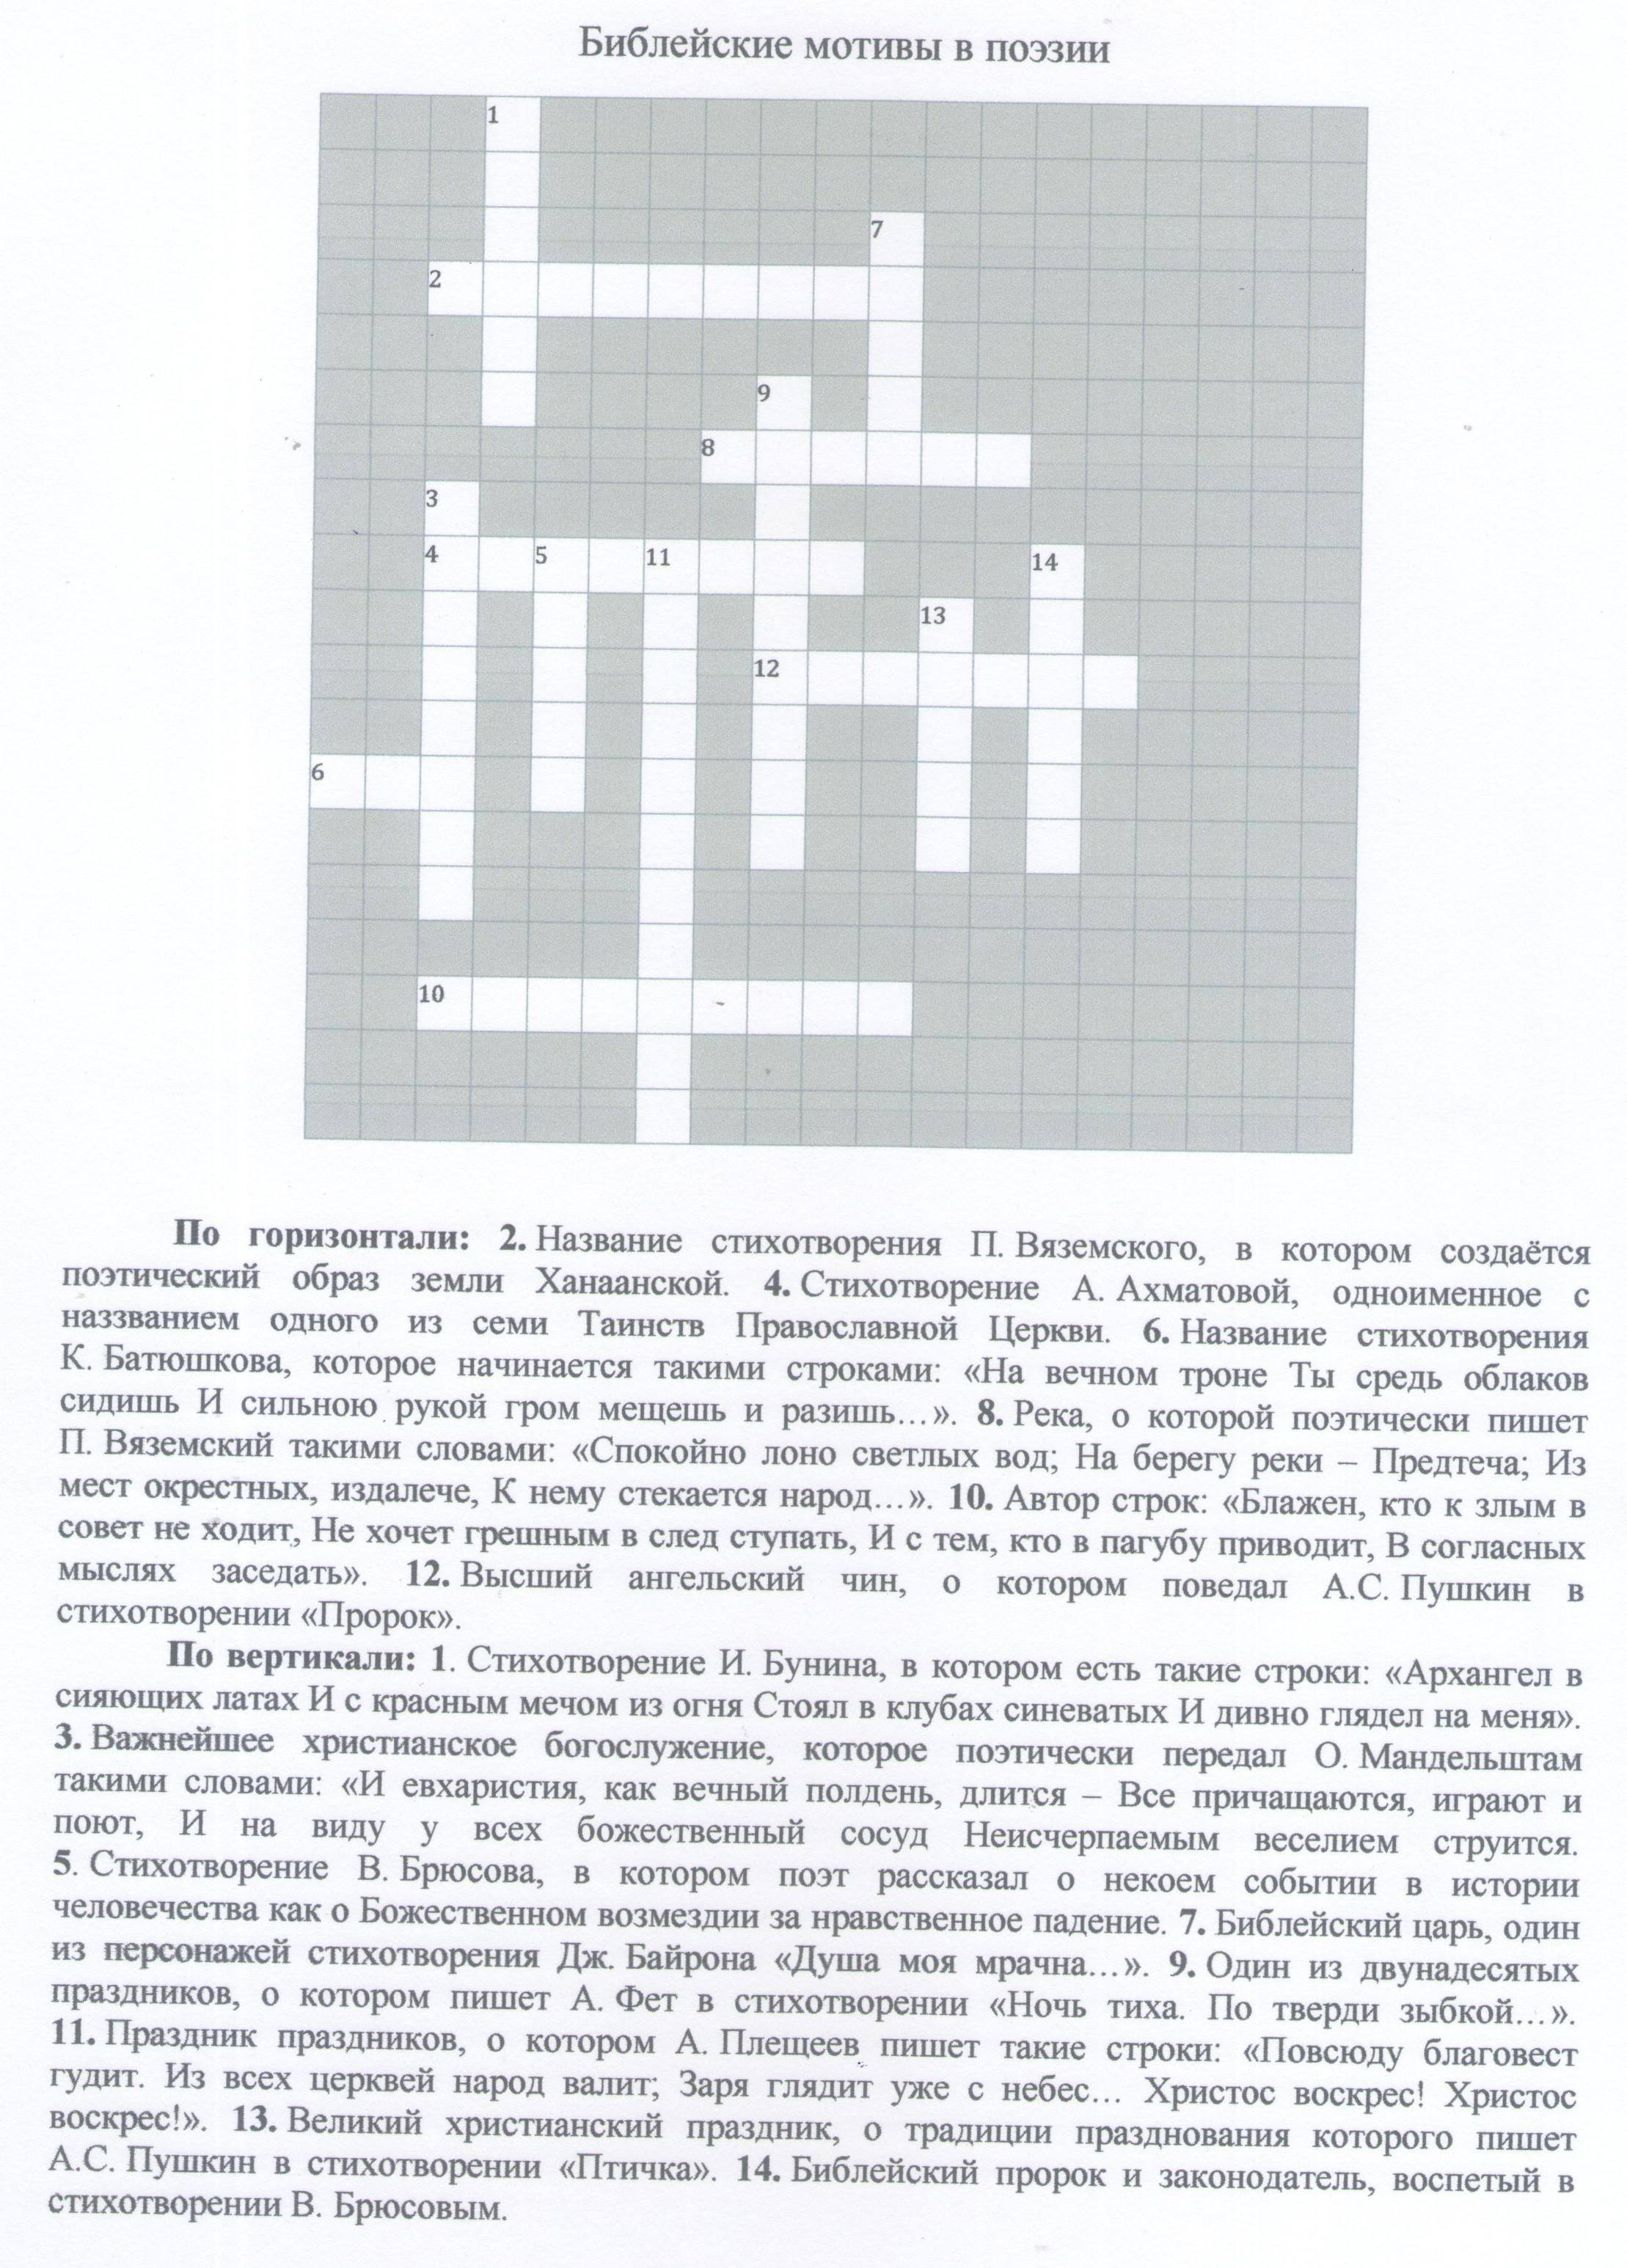 Радченко О.Н.